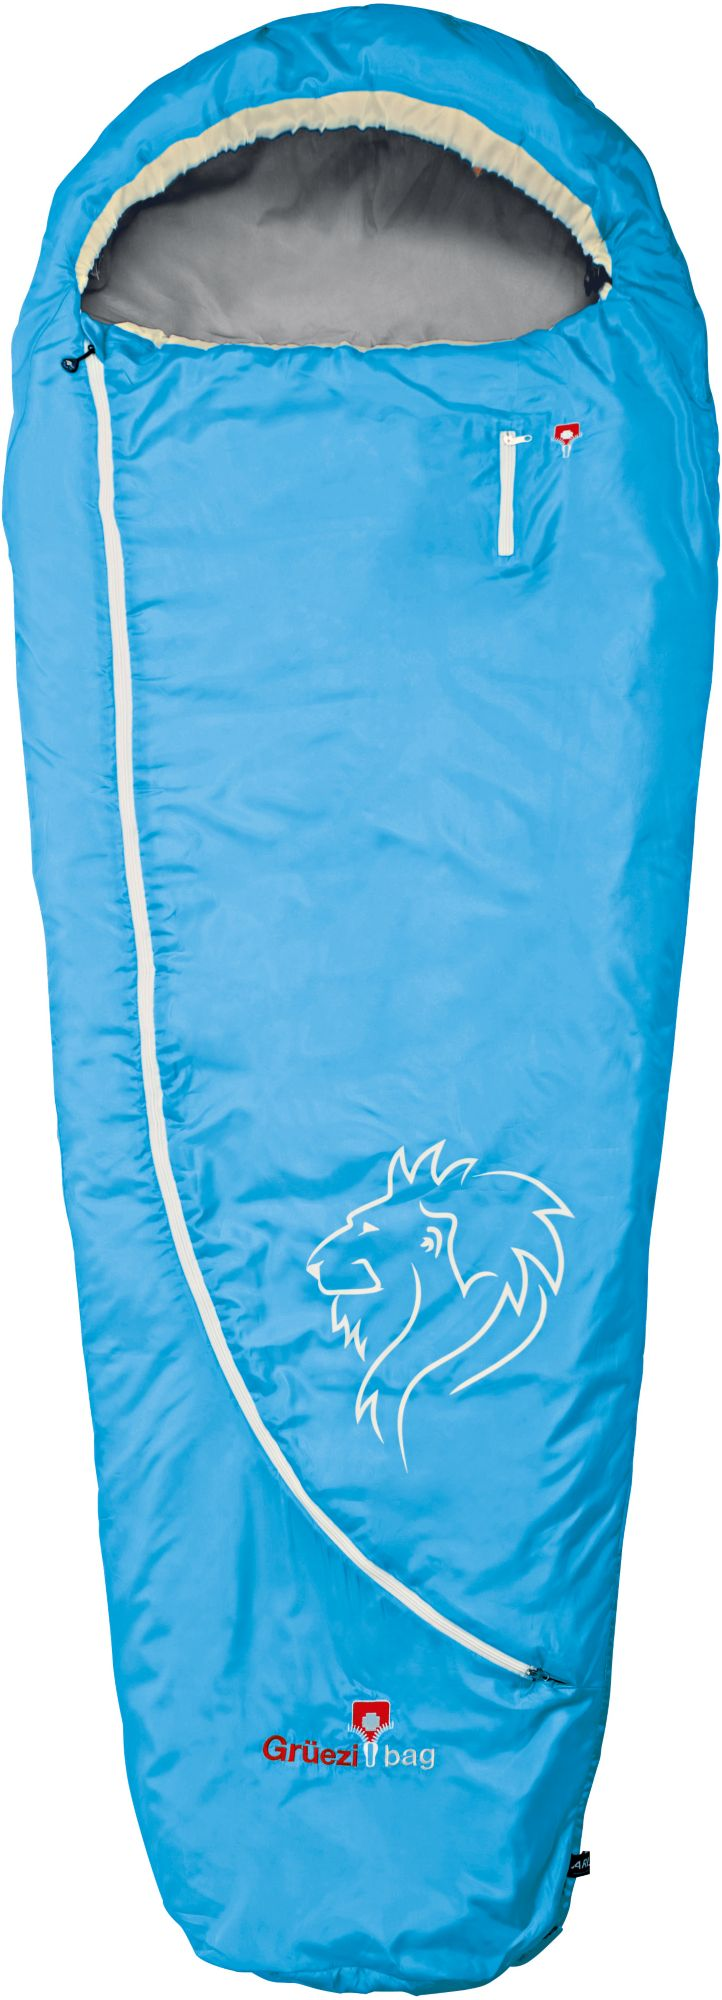 GRÜEZI BAG Grüezi bag Leichtschlafsack, »Mumie Lion«